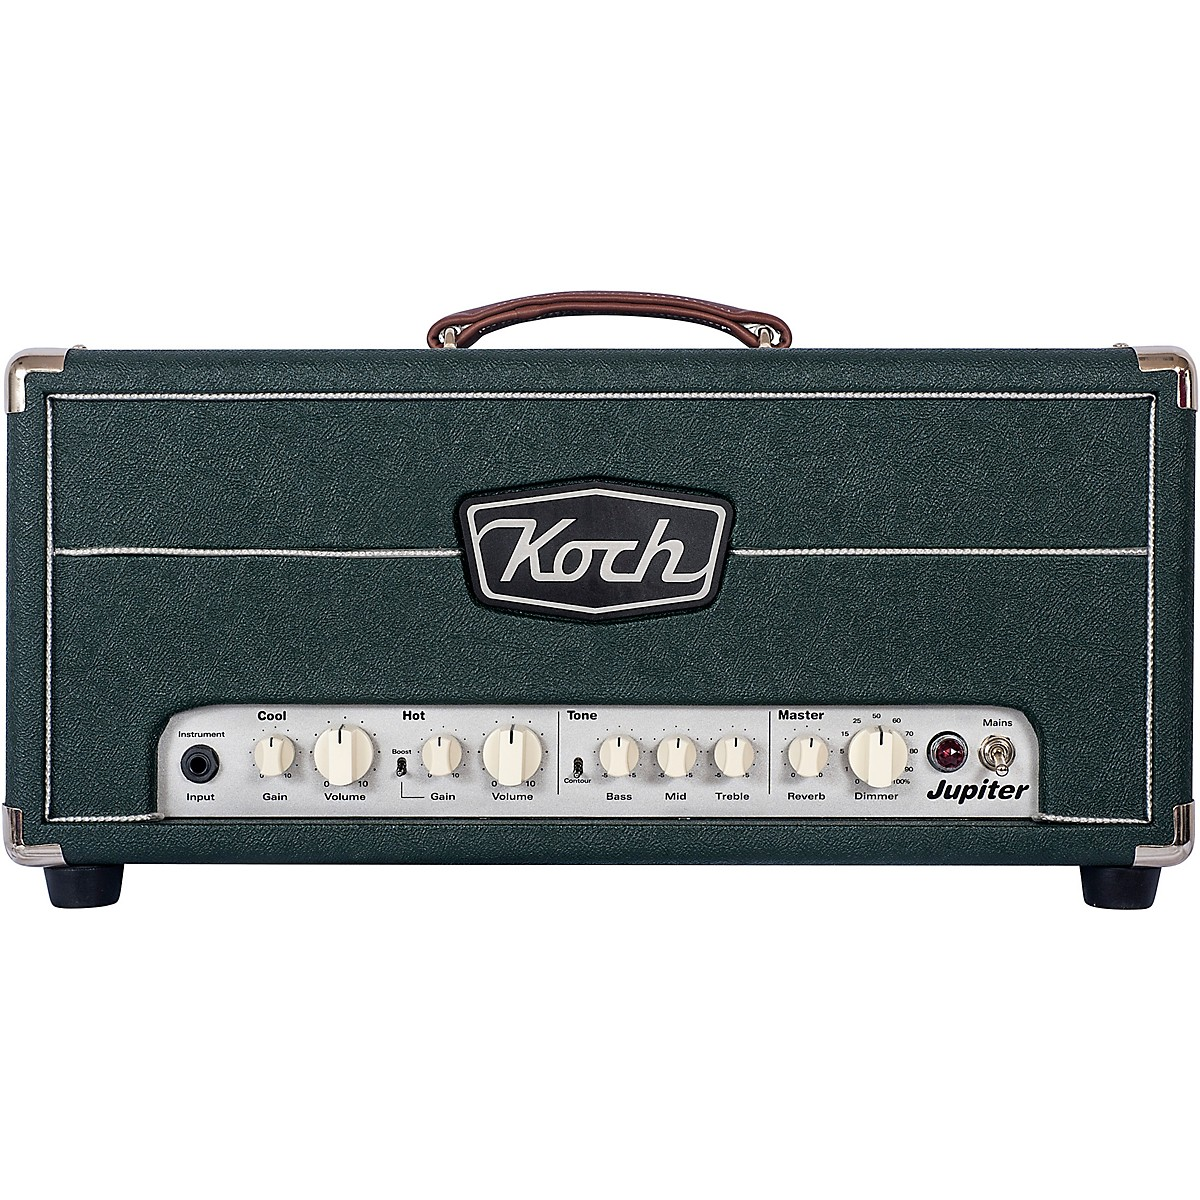 Koch Jupiter 45 45W Tube Hybrid Guitar Amp Head